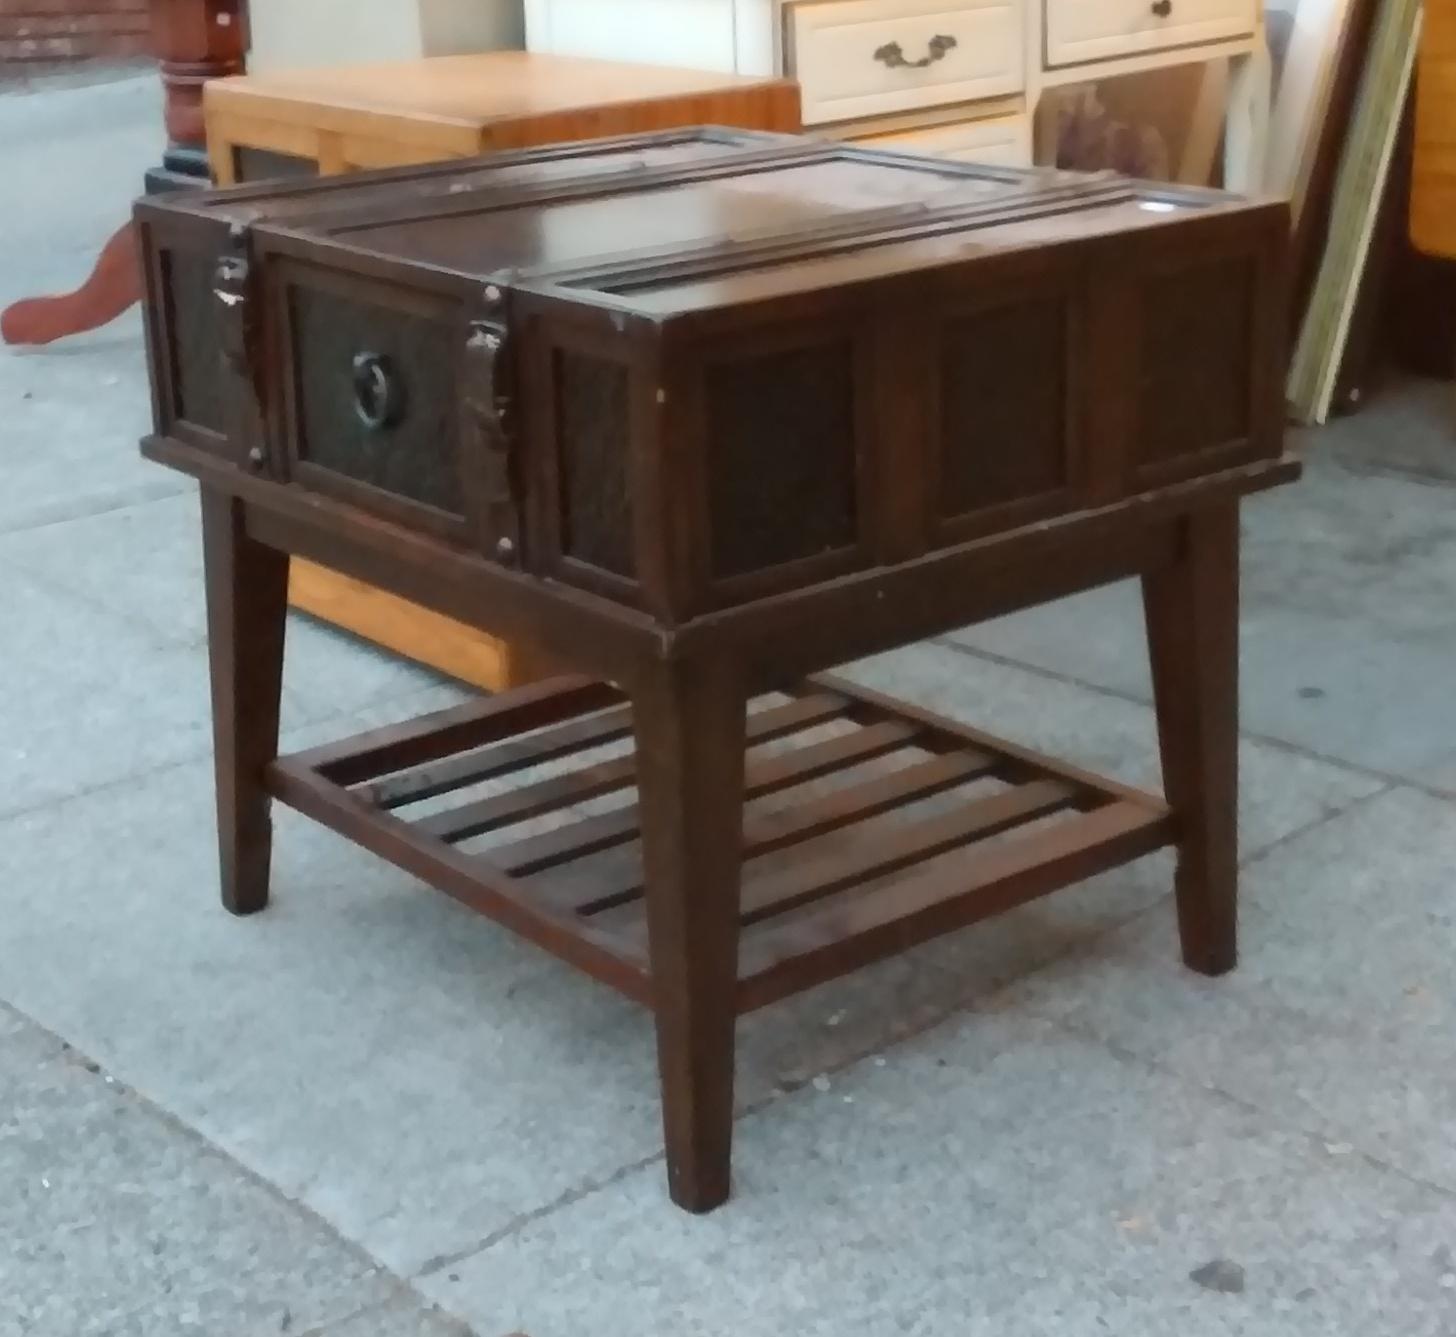 Luggage Style Furniture: UHURU FURNITURE & COLLECTIBLES: SOLD **BARGAIN BUY** #9430